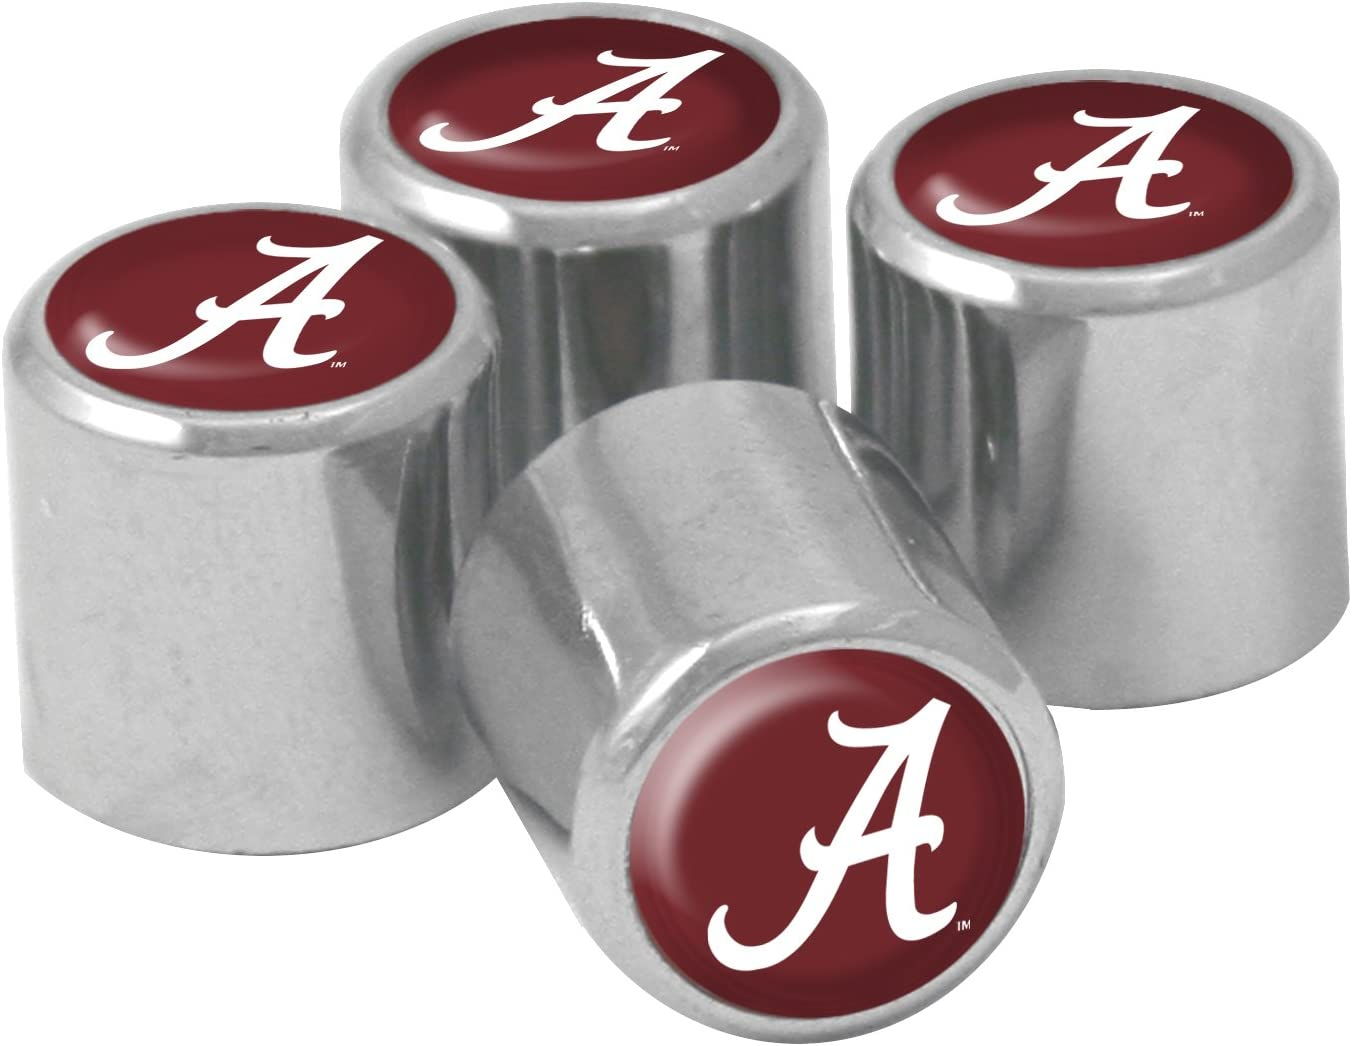 4-Pack NCAA Alabama Crimson Tide Metal Tire Valve Stem Caps